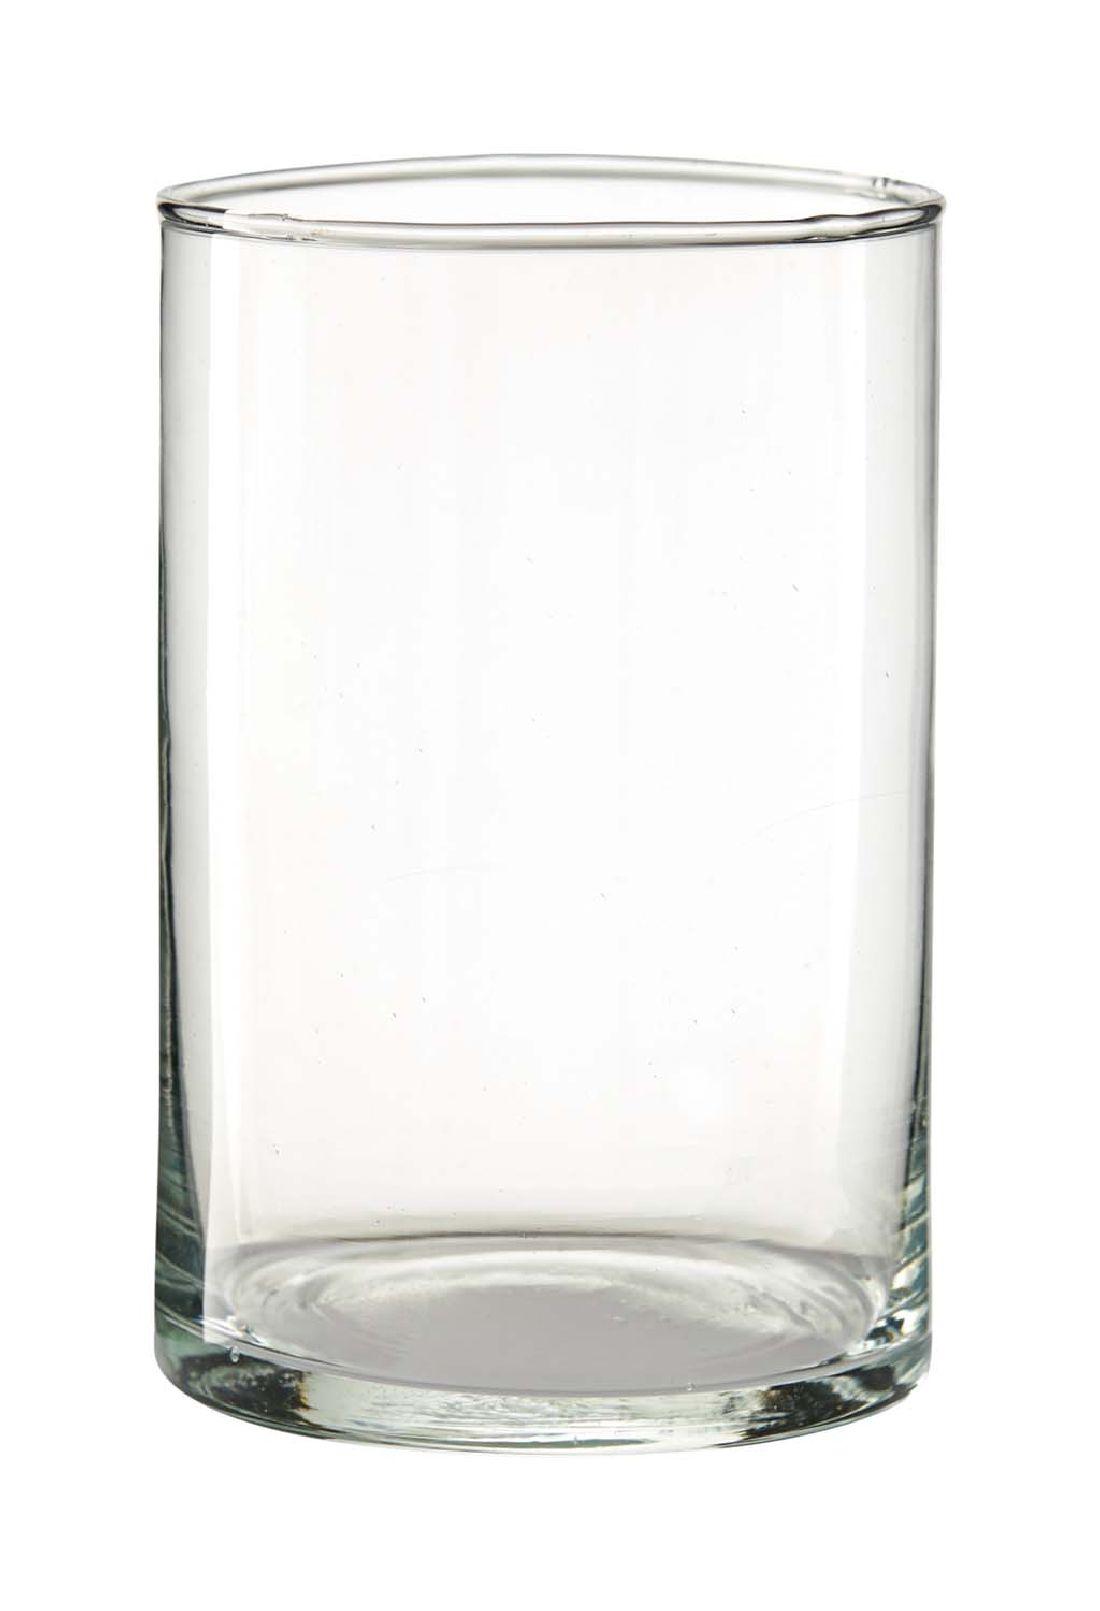 Zylinder Glas press KLAR 1850/10 Ø10cm x H10cm